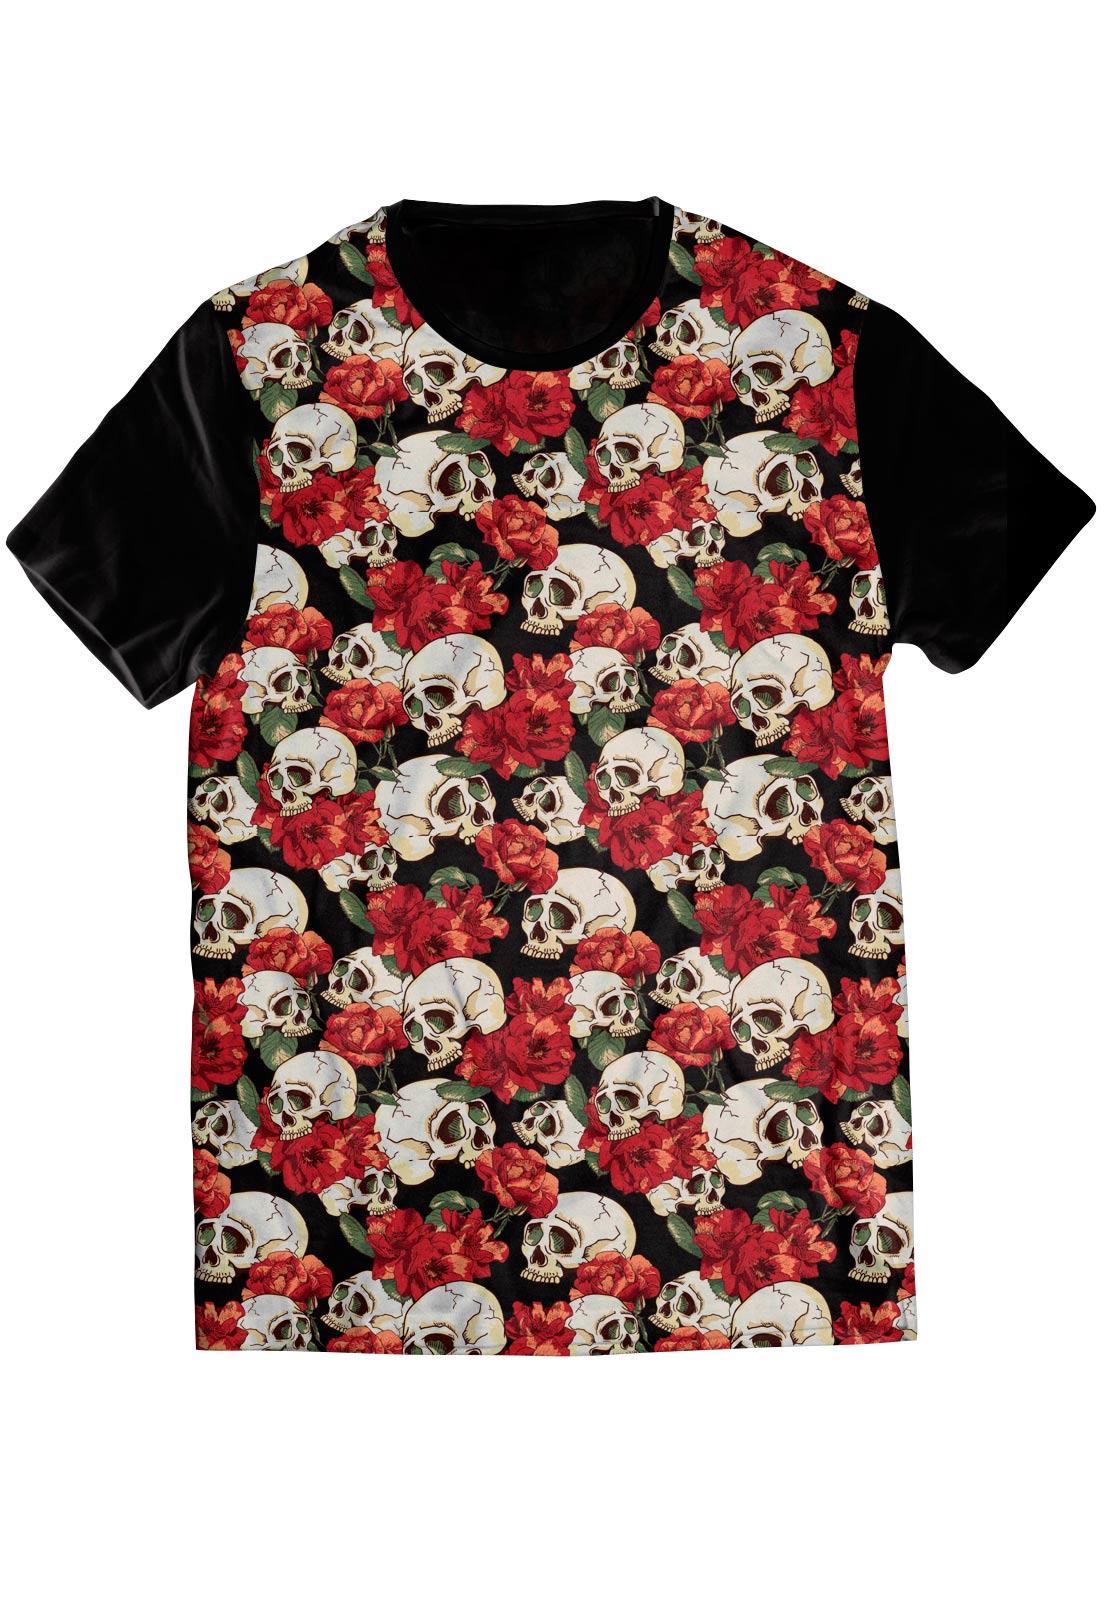 Camiseta Caveira Mexicana Floral Skull Tshirt Swag Camisa